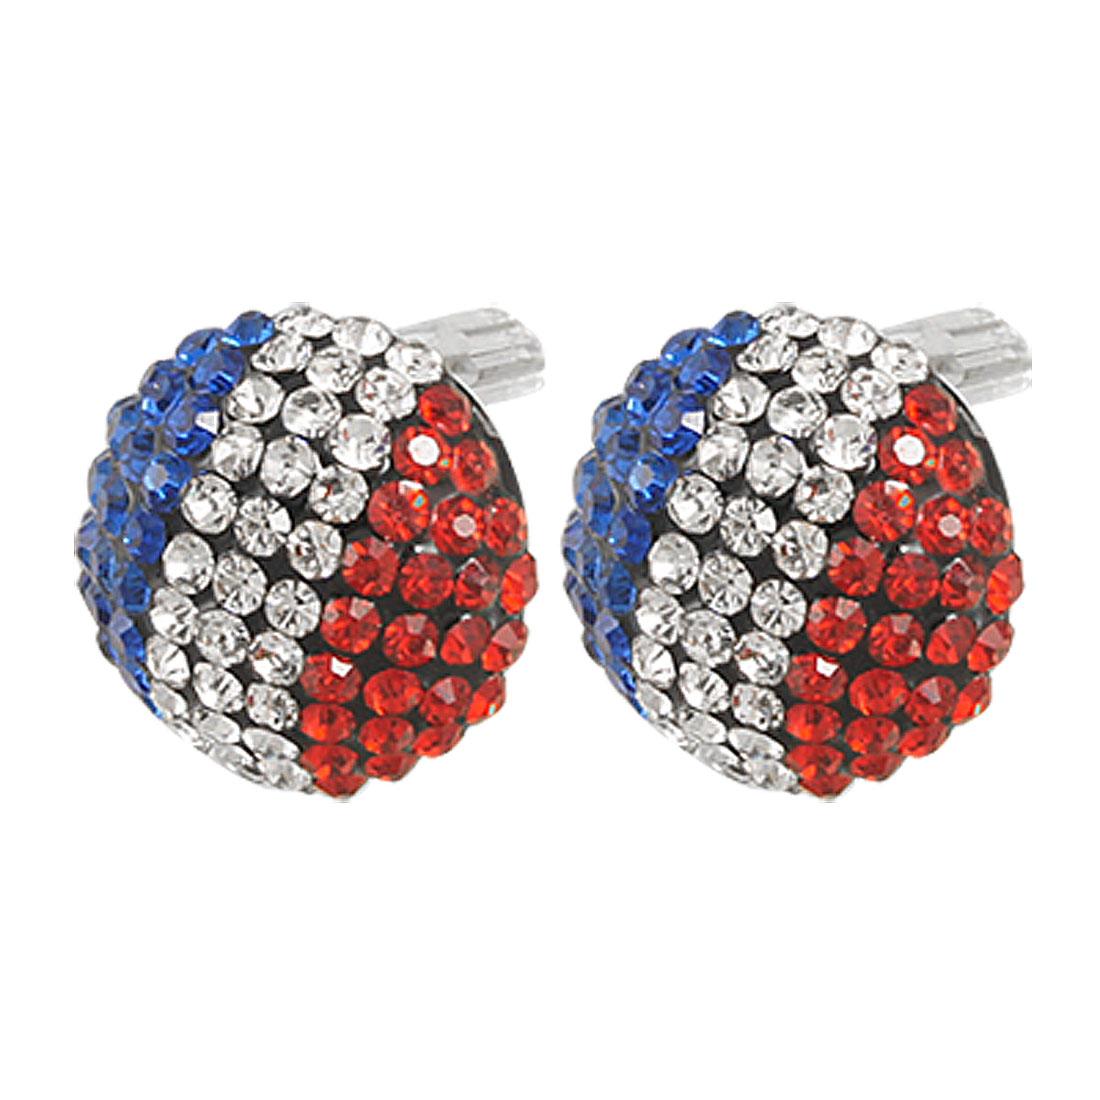 Women Blue Red Silver Tone Rhinestone Color Block 15mm Half Ball Studs Earrings Earstuds Pair